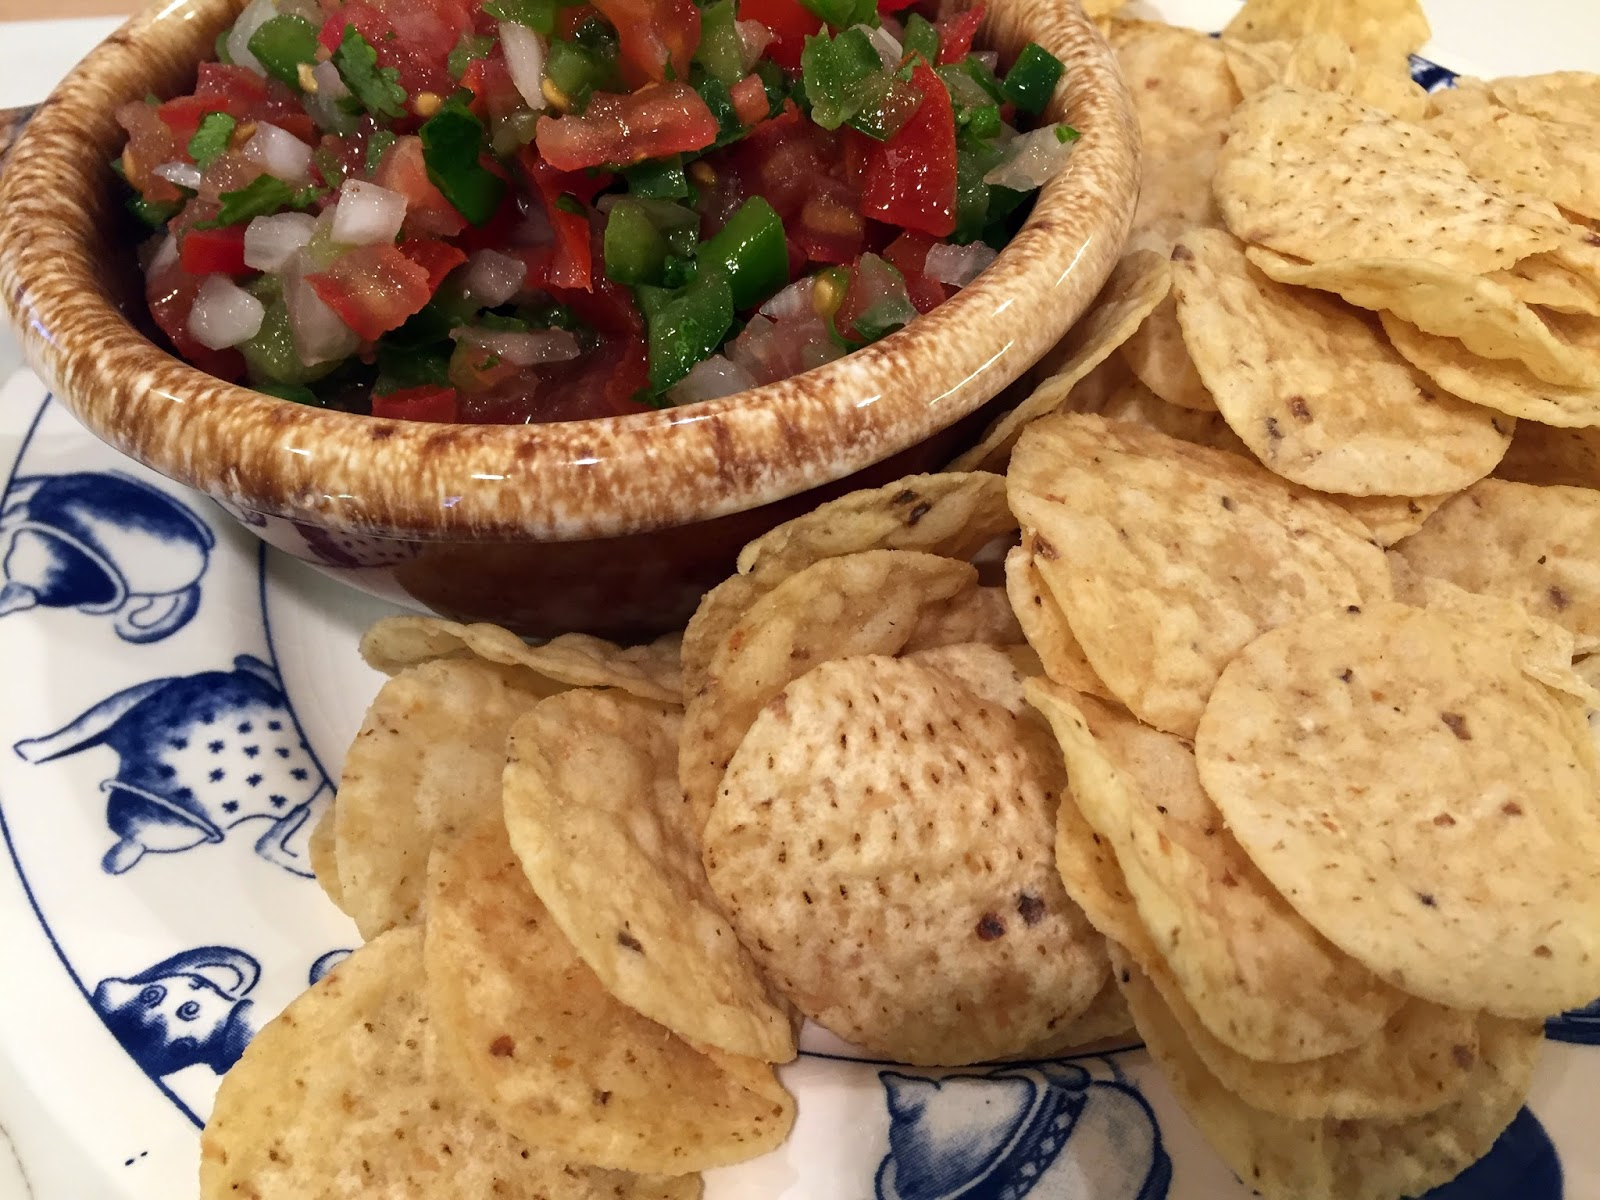 Rosemary's Sampler: 2017 Herb of the Year Salsa